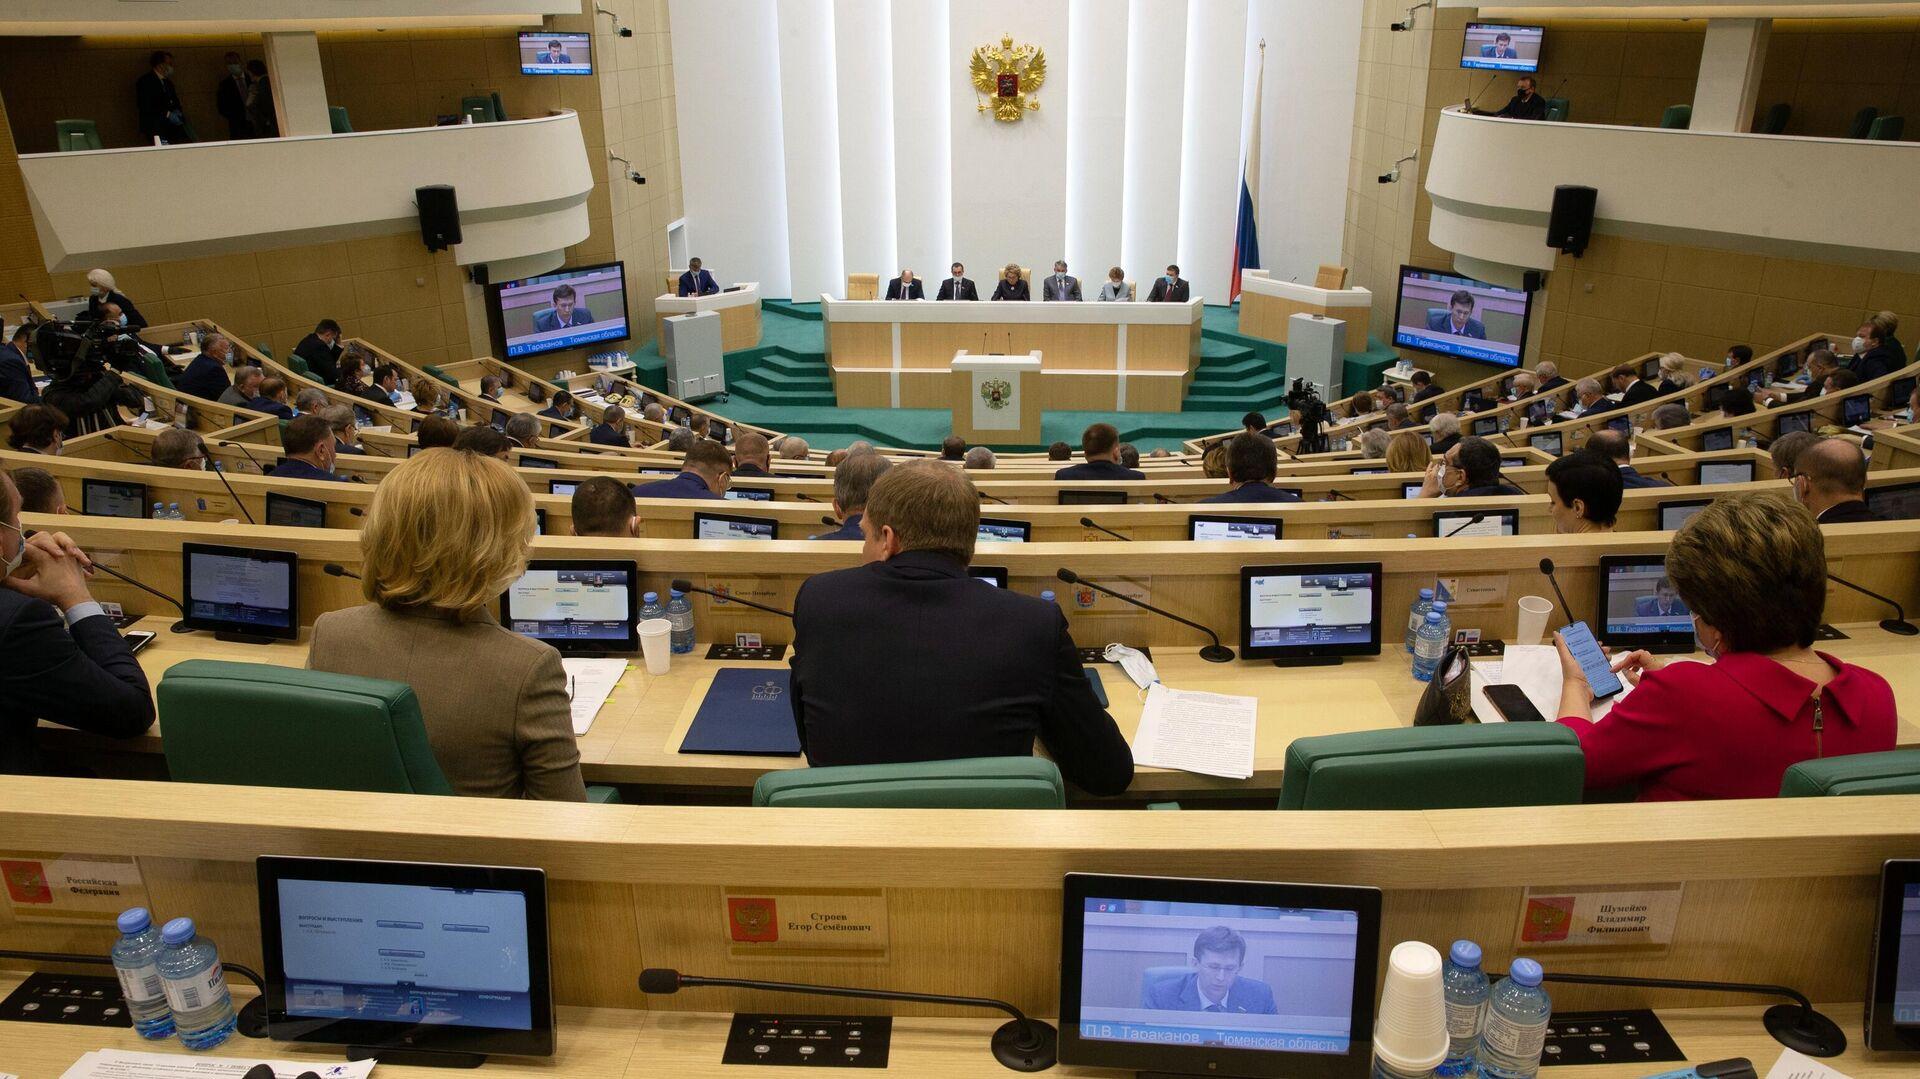 Заседание Совета Федерации РФ - РИА Новости, 1920, 29.09.2020